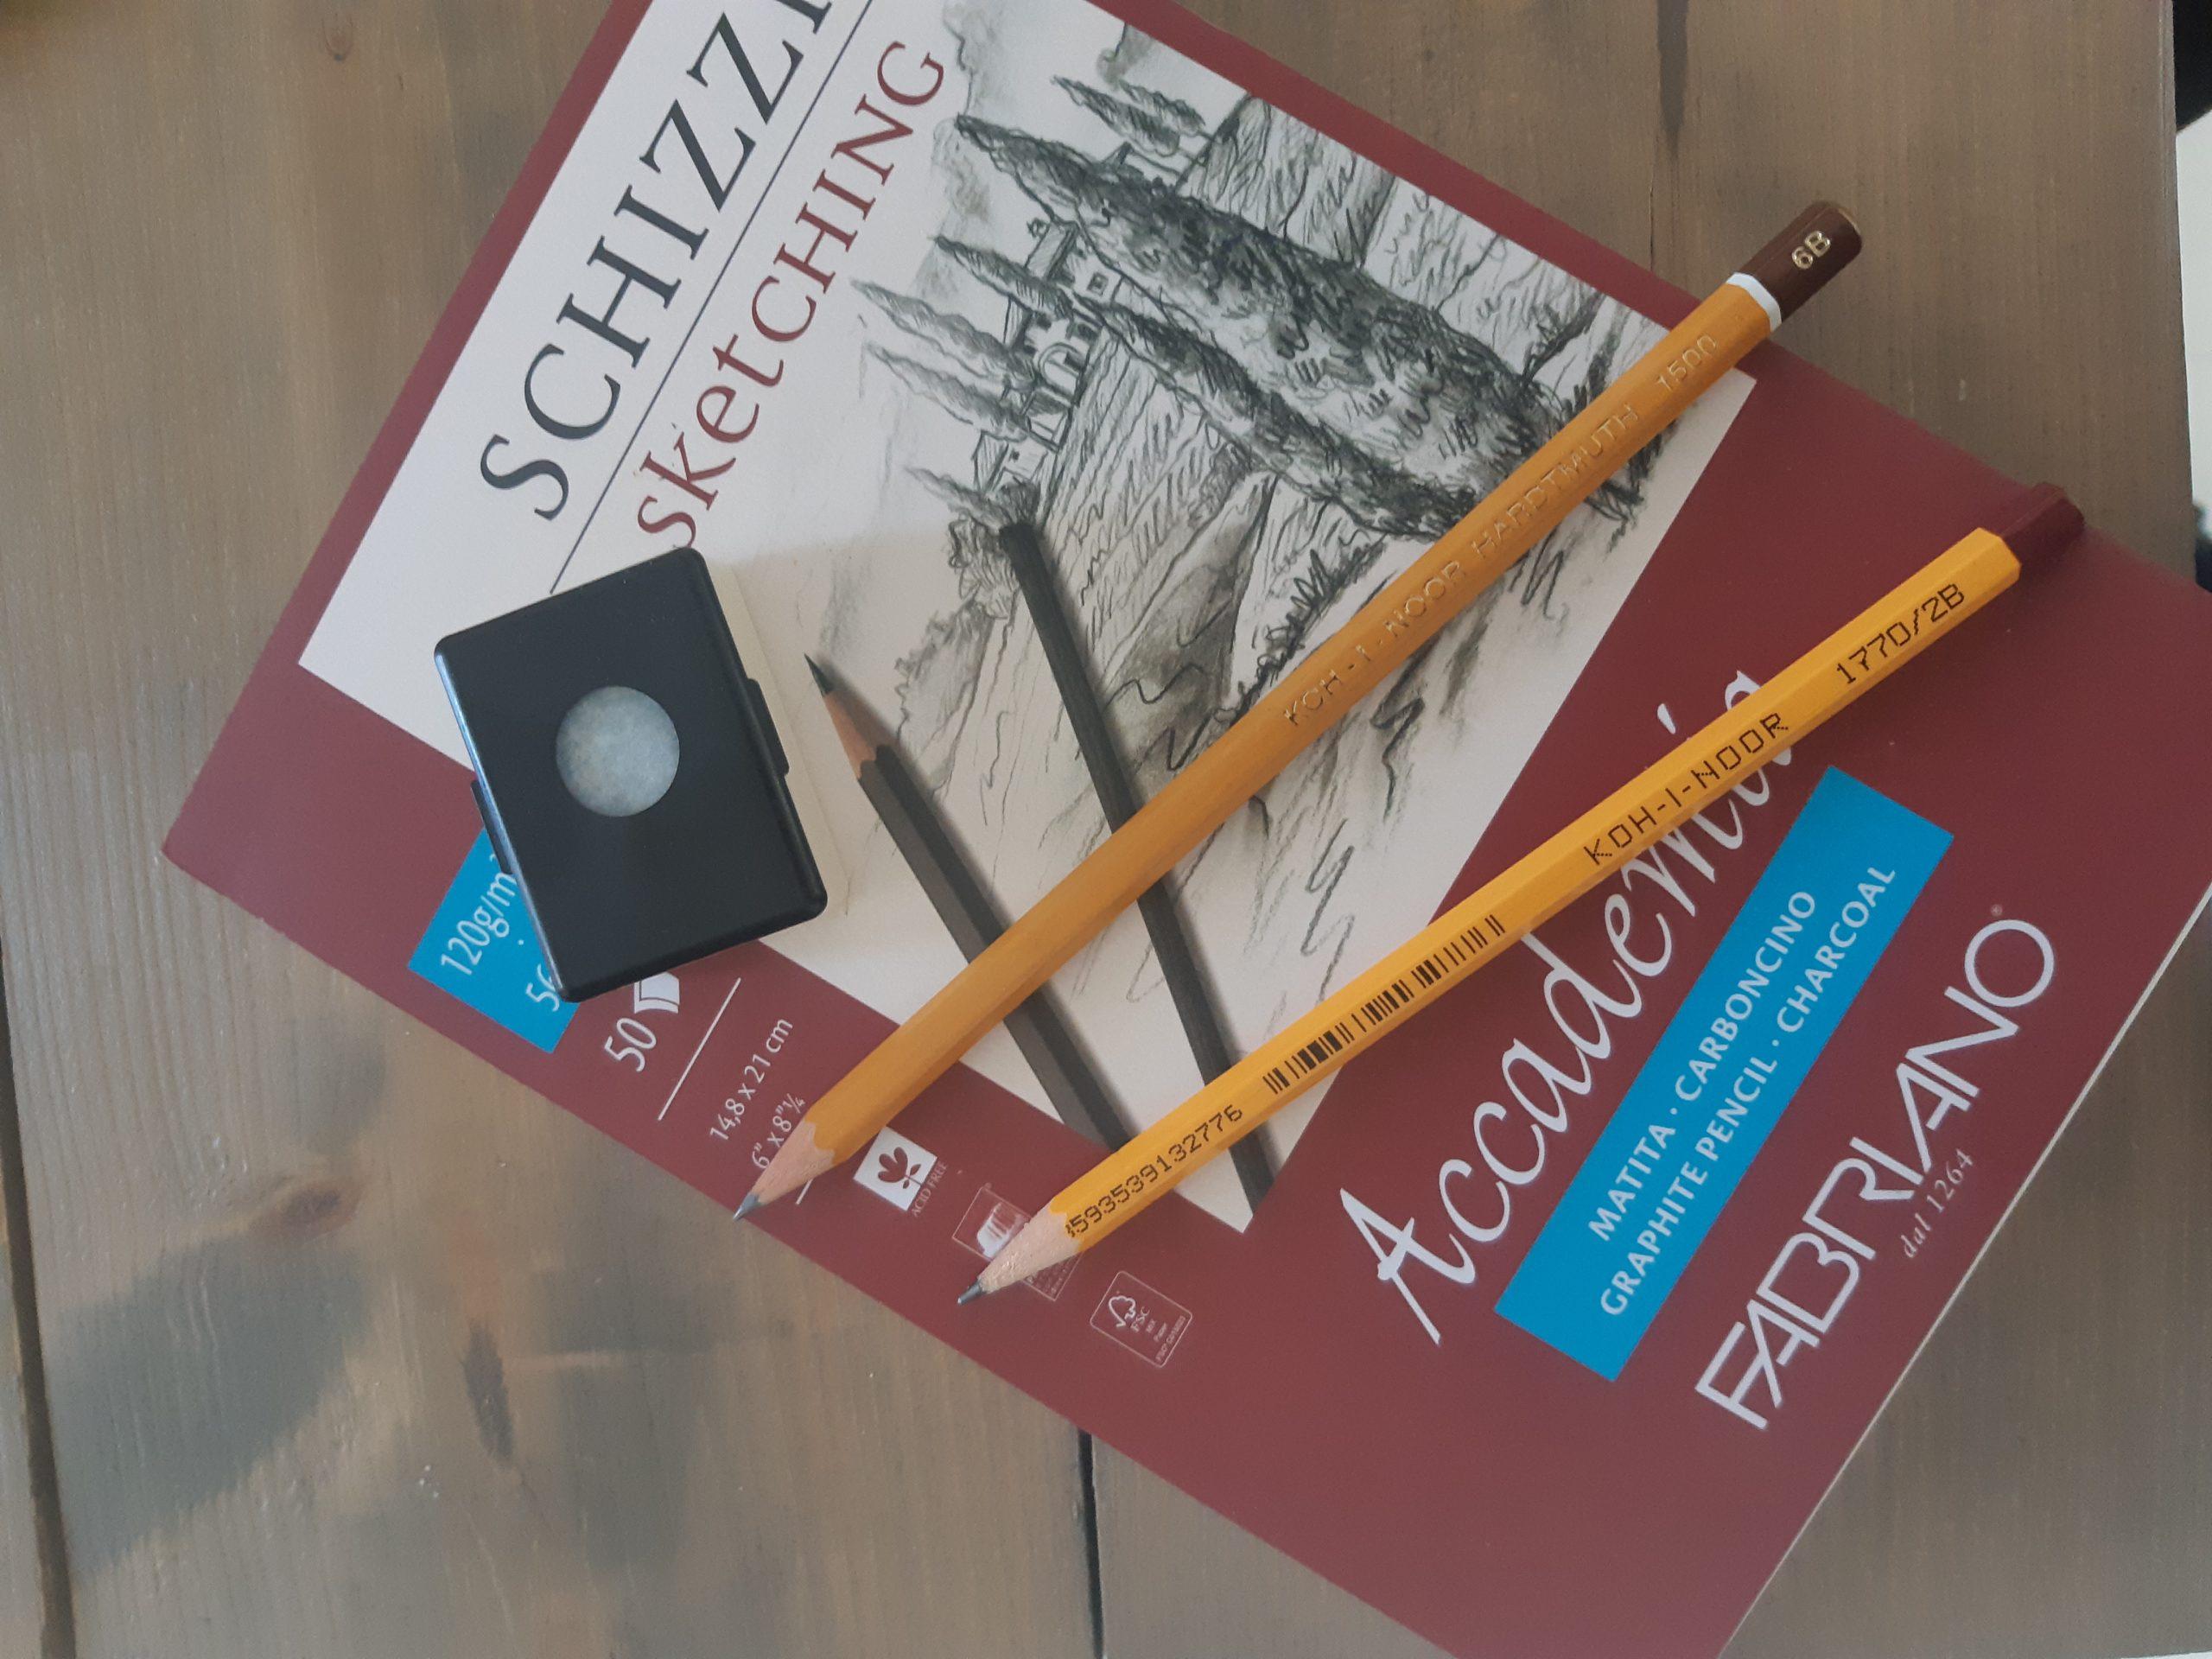 ceruzák, rajztömb, radír